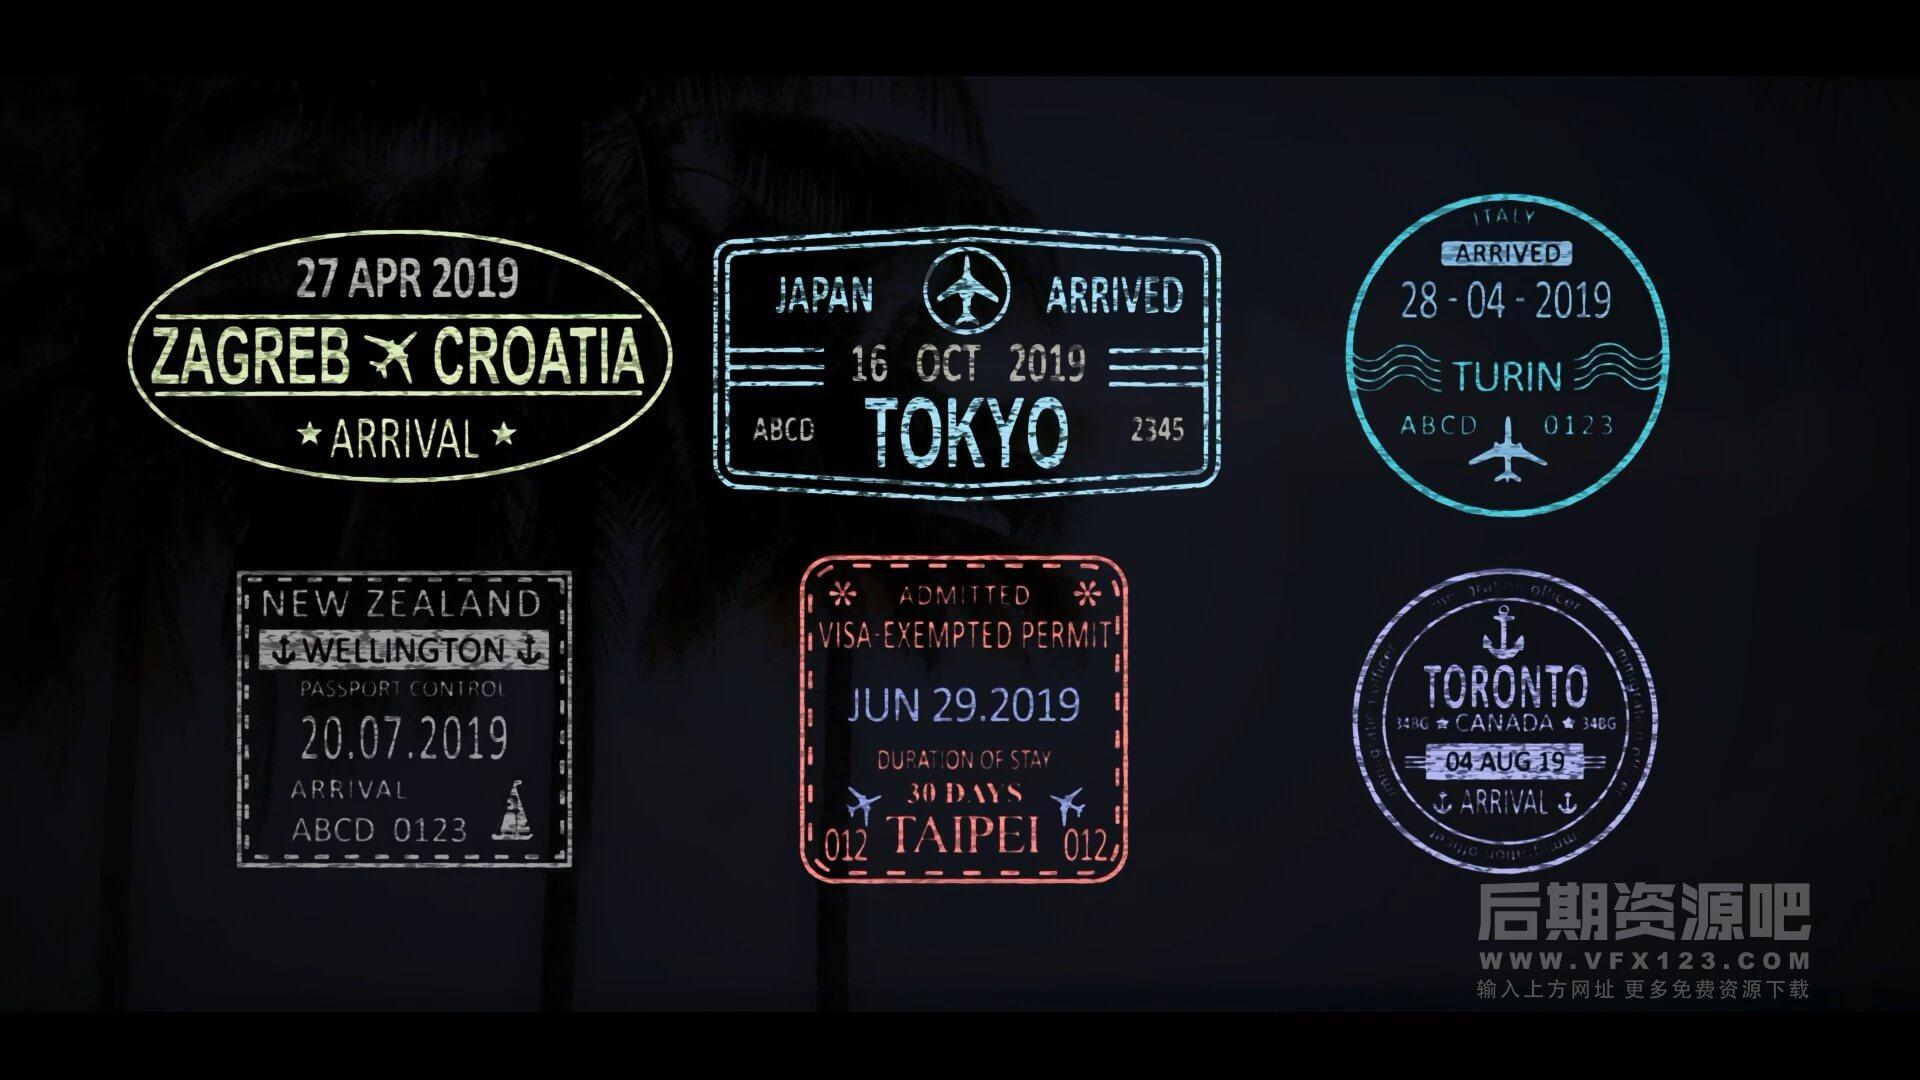 AE模板 50组旅行邮票印章邮戳动画 旅拍影片常备 Travel Stamps